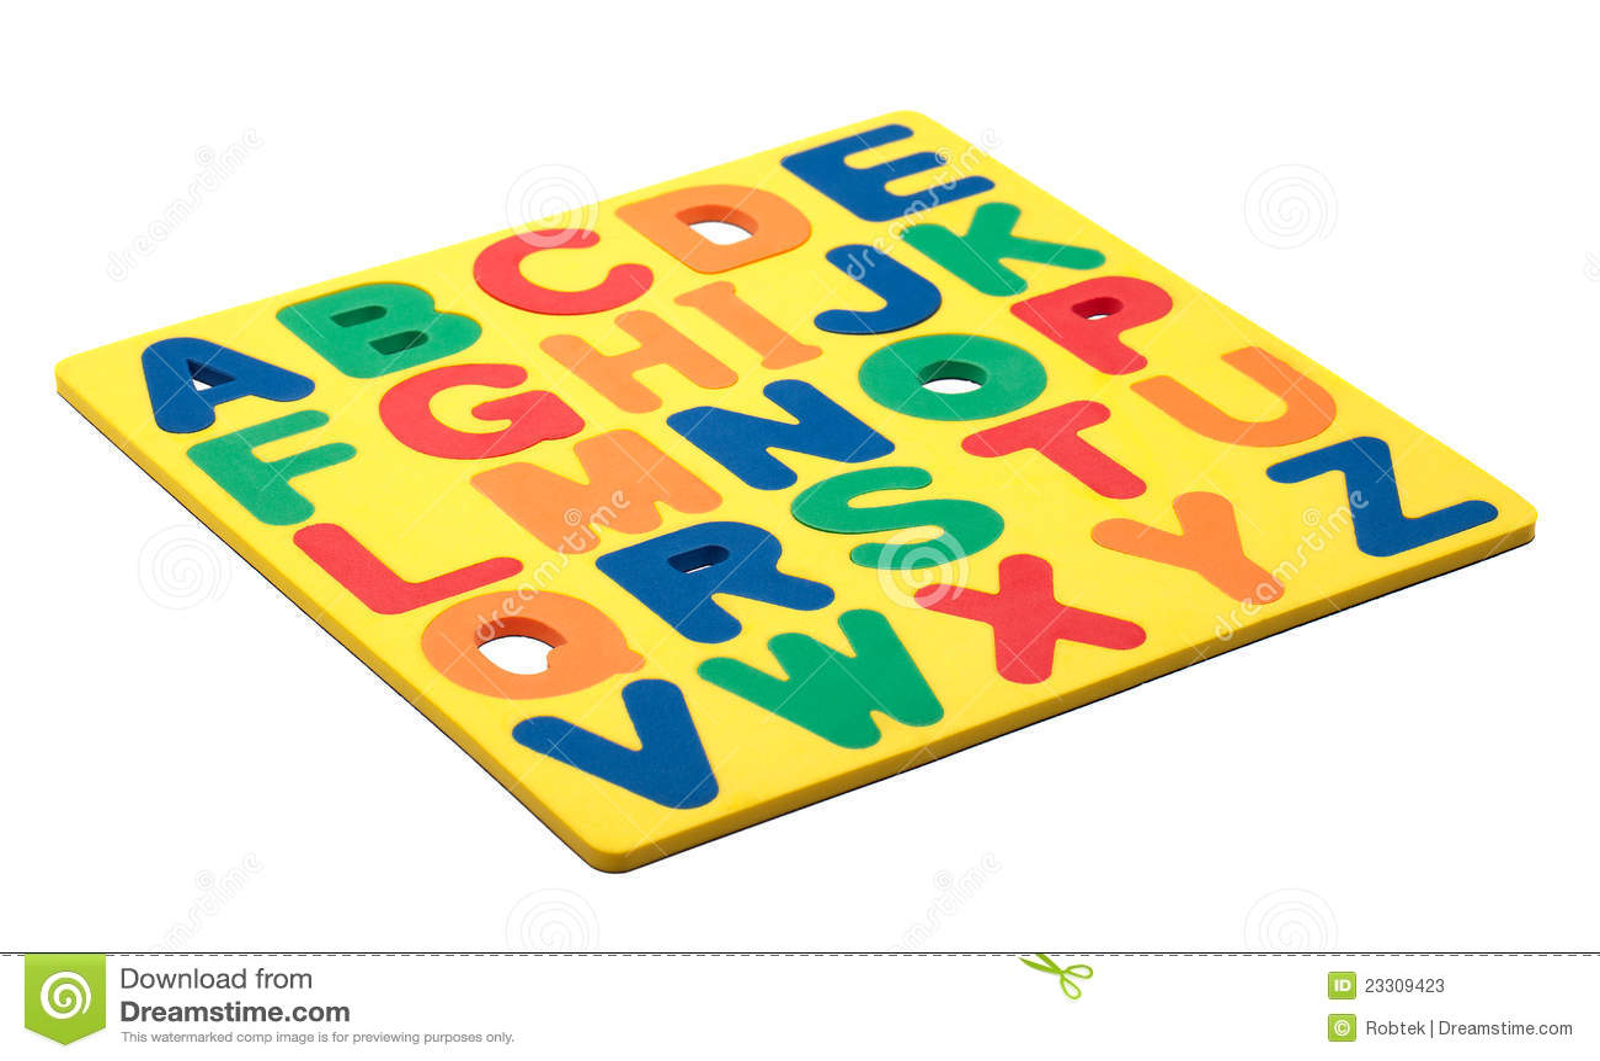 Abc Foam Letters Stock Image Image Of Foam Colors